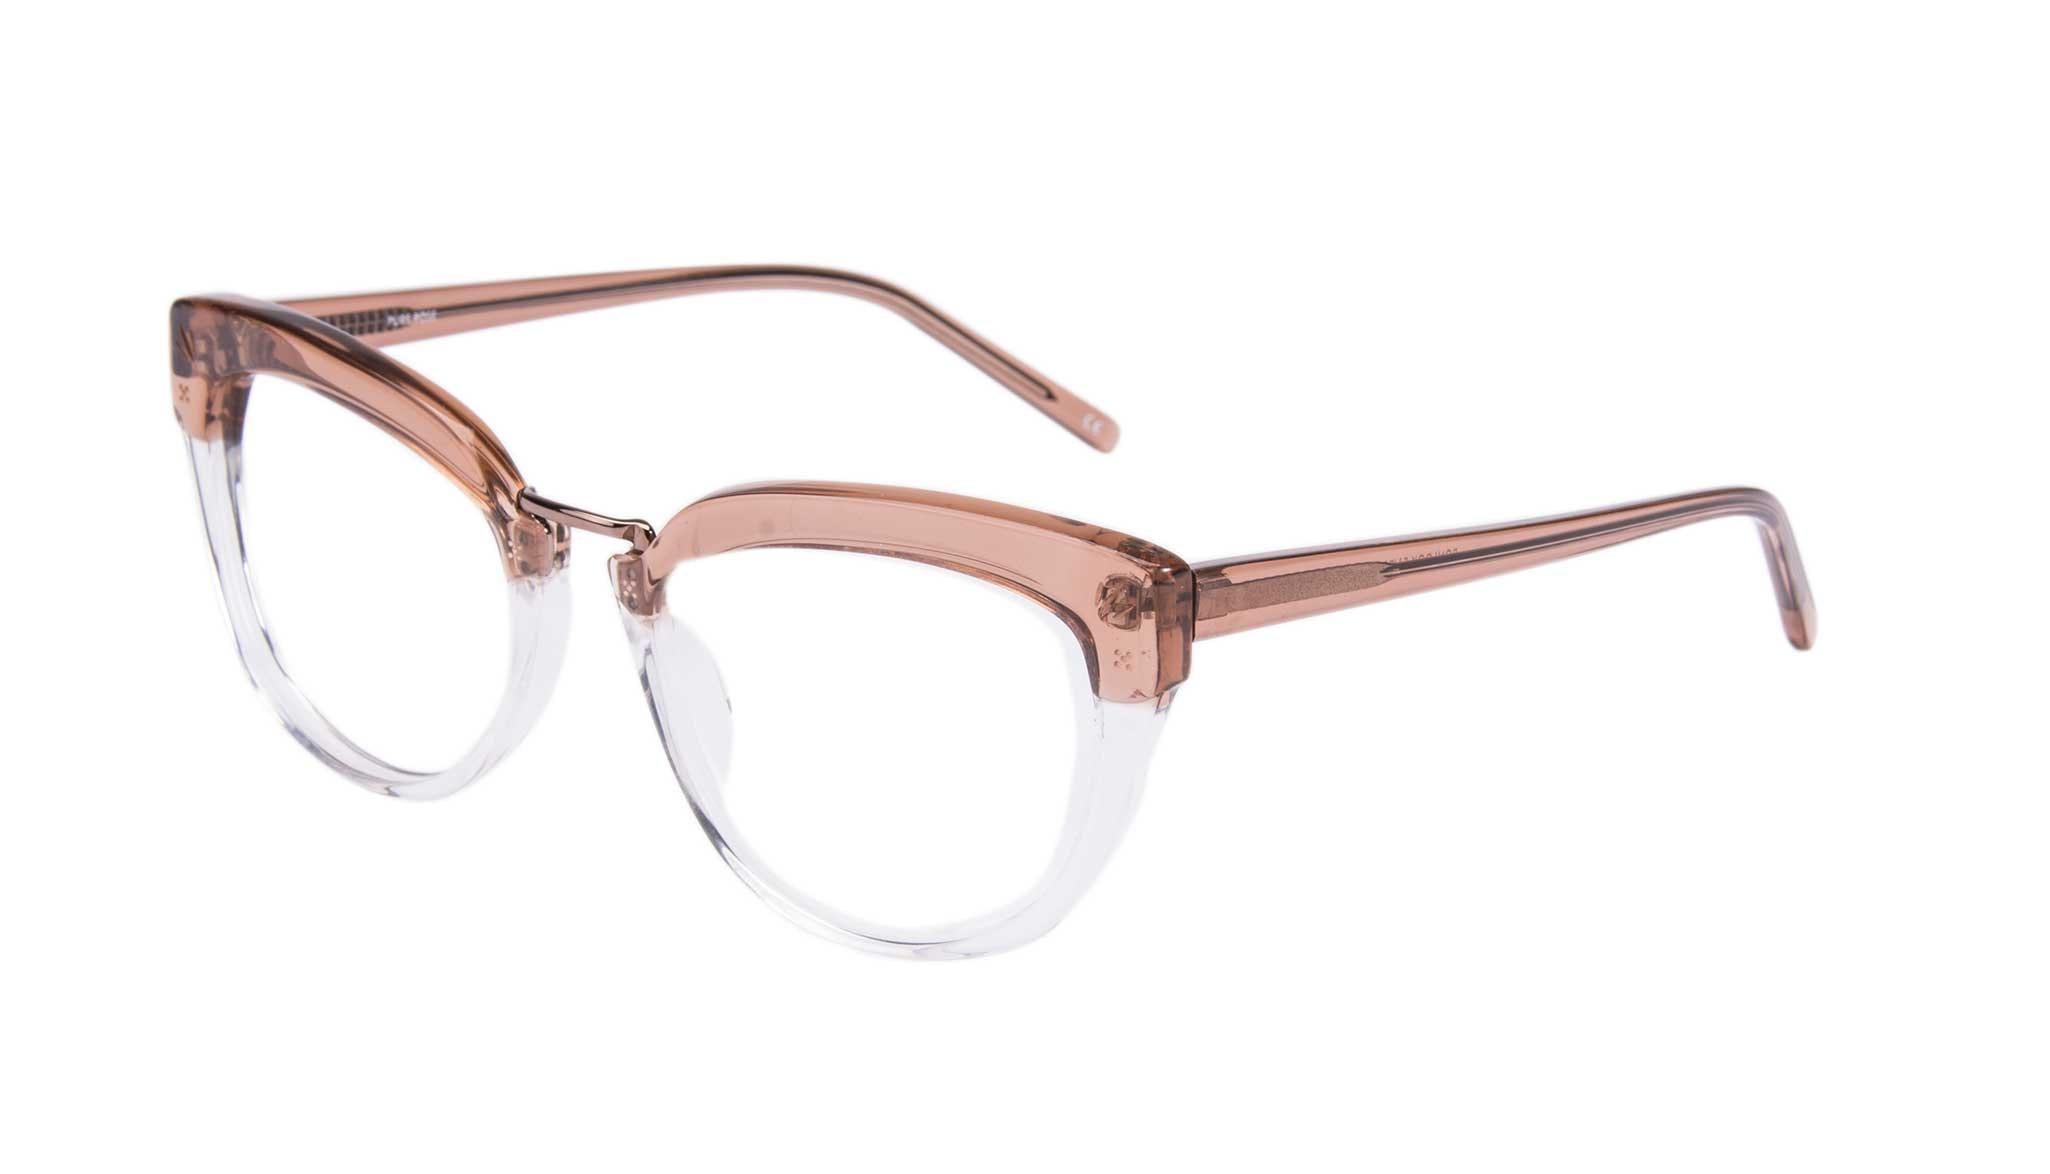 Affordable Fashion Glasses Cat Eye Daring Cateye Eyeglasses Women Pure Rose Tilt